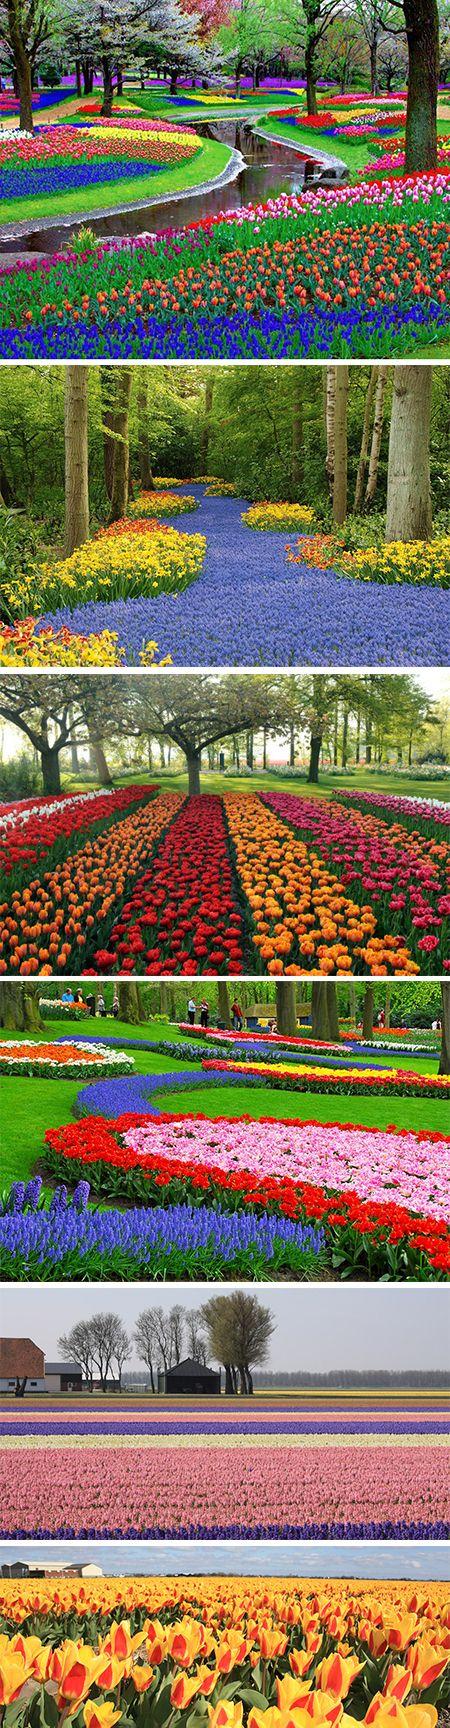 Keukenhof -largest flower garden in Europe-, Netherlands